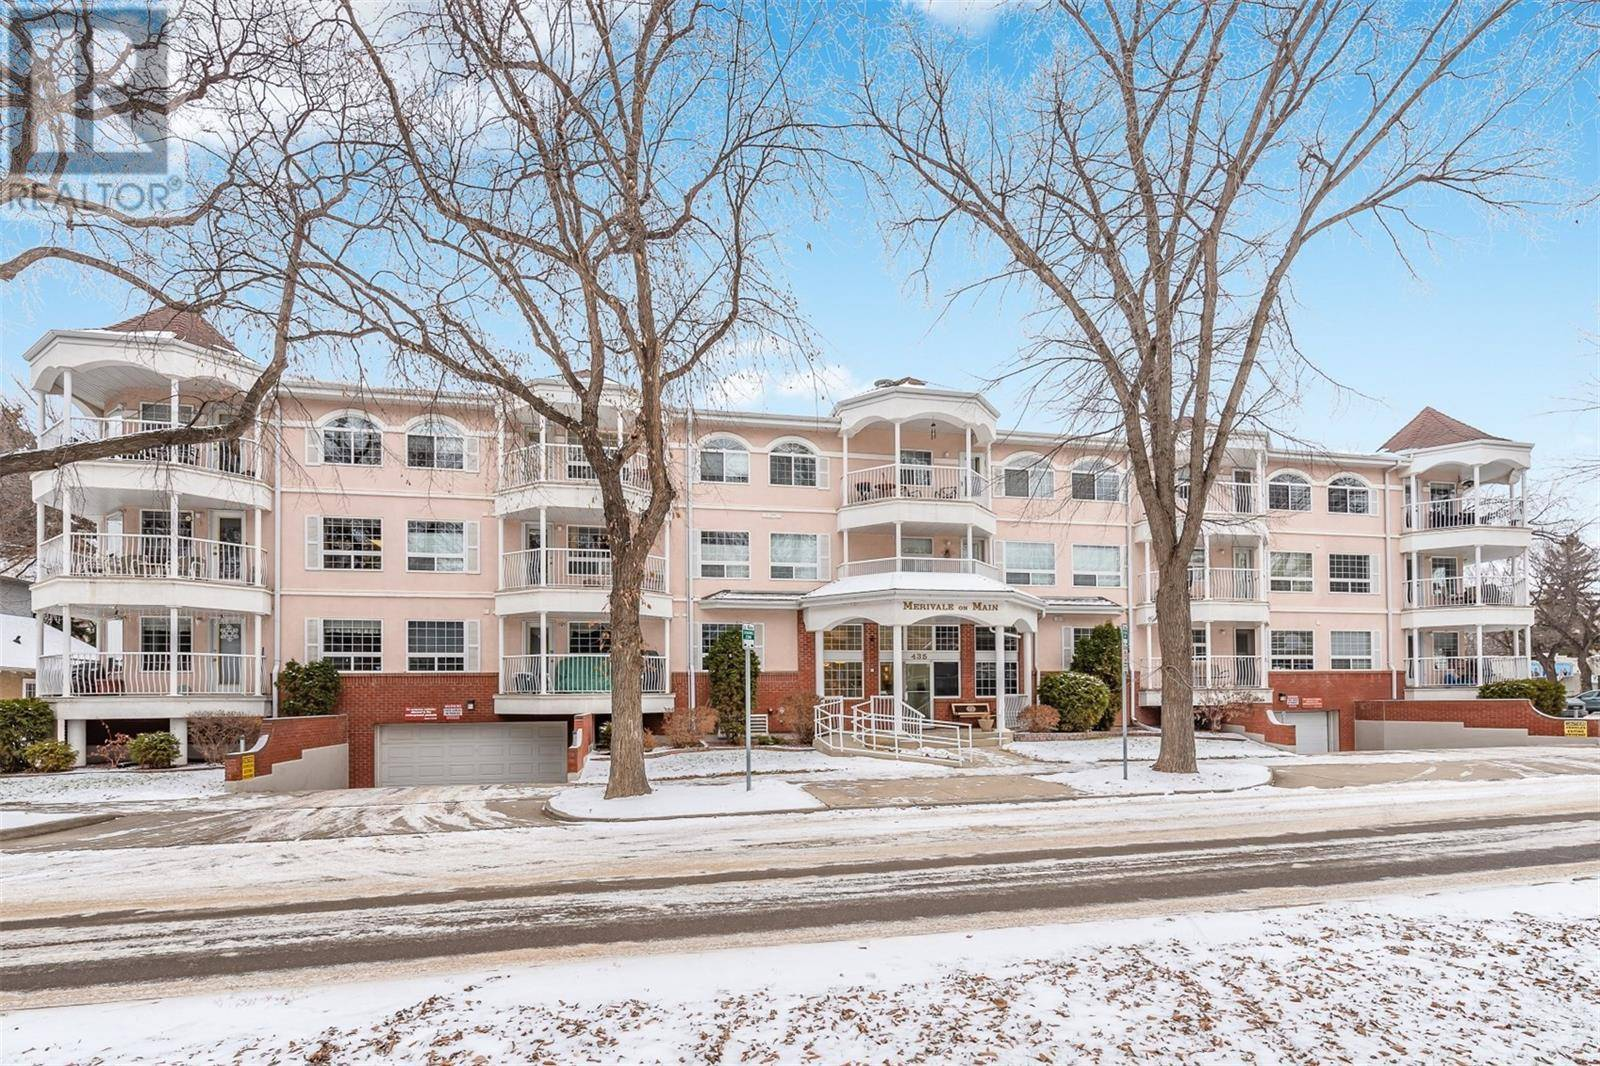 Condo for sale at 435 Main St Unit 106 Saskatoon Saskatchewan - MLS: SK791339